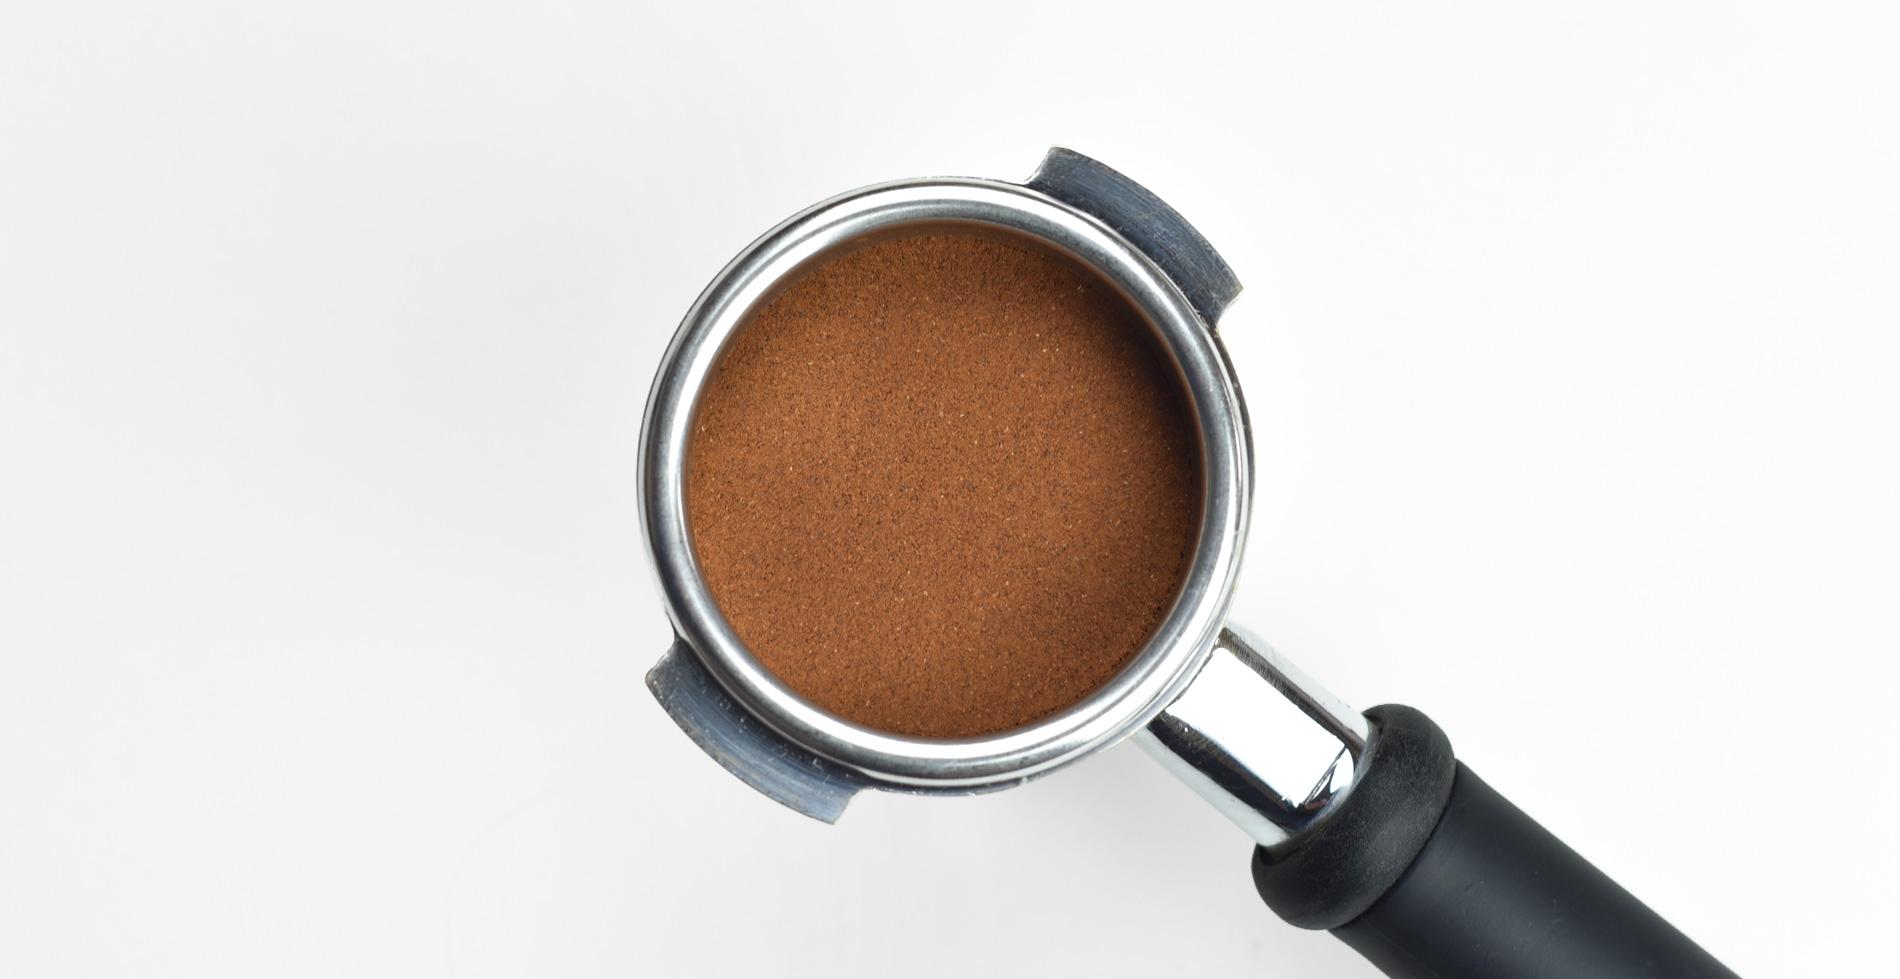 The Coffee Officina Shop Coffee Brill Espresso Blend